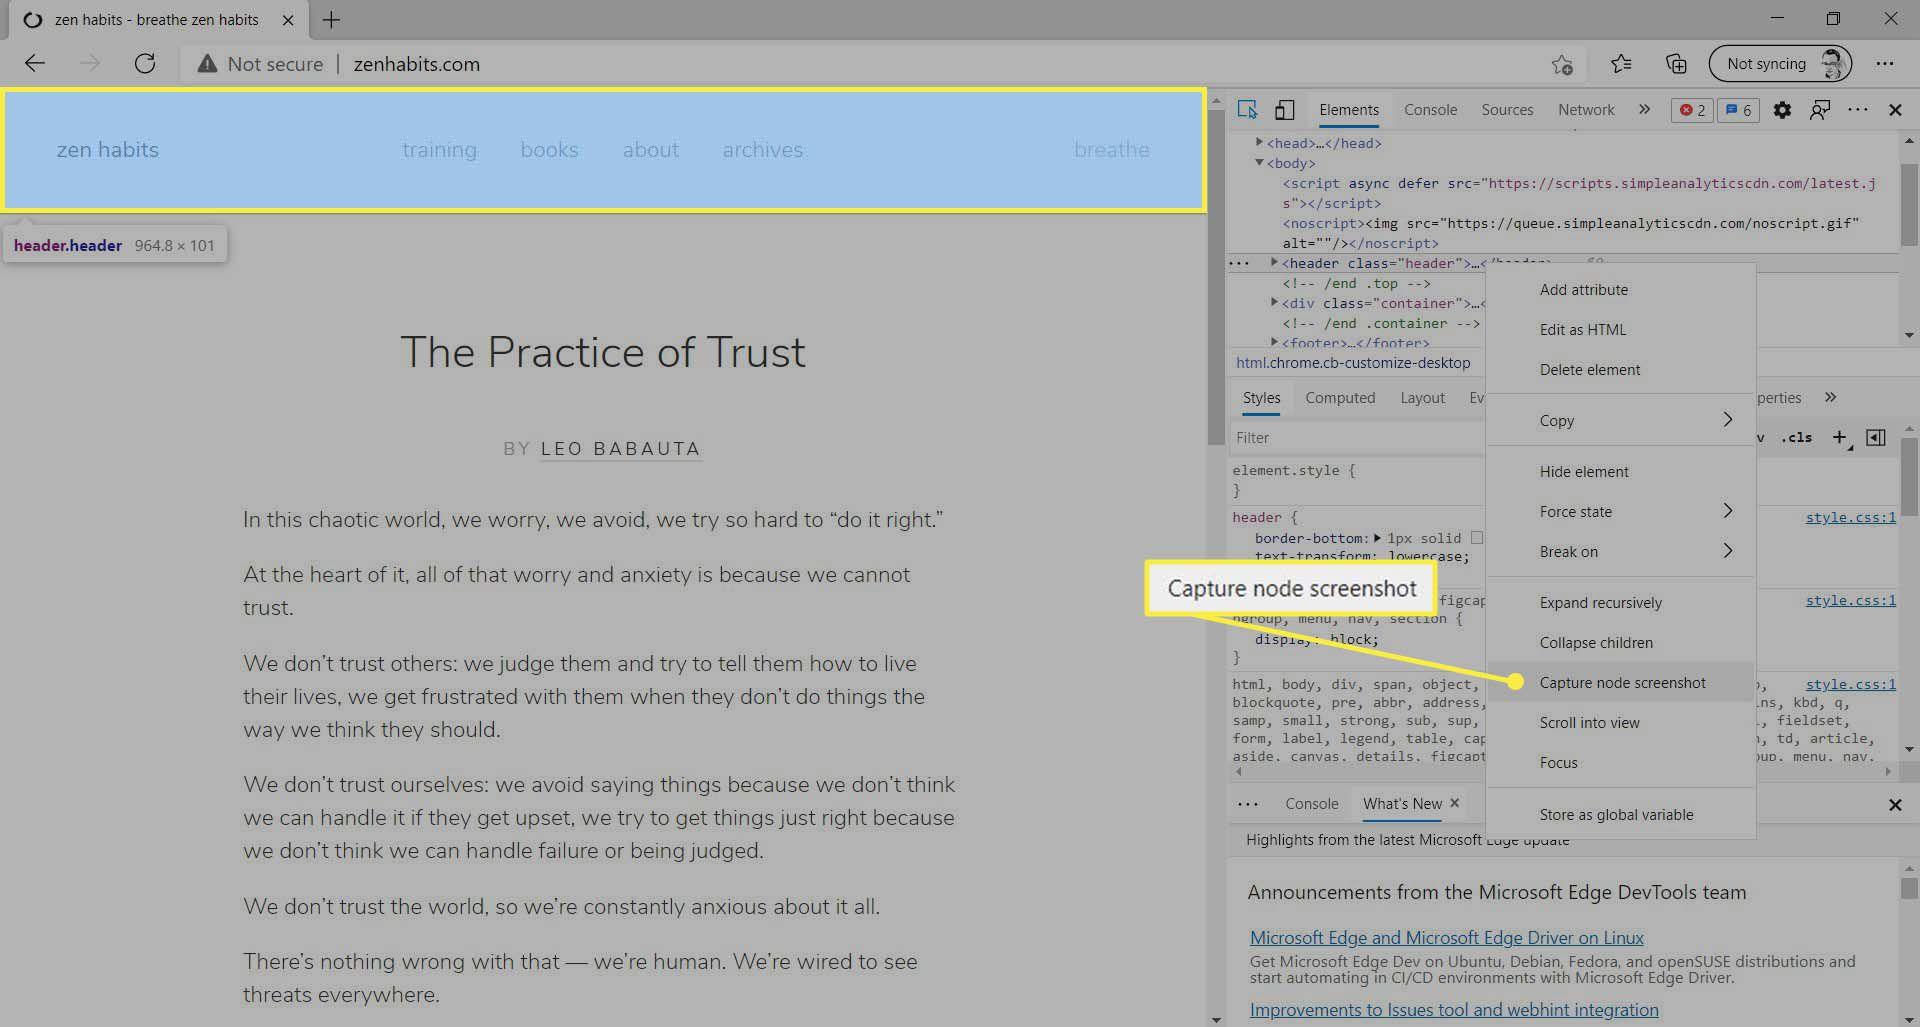 Capture node screenshot menu item highlighted in Microsoft Edge.